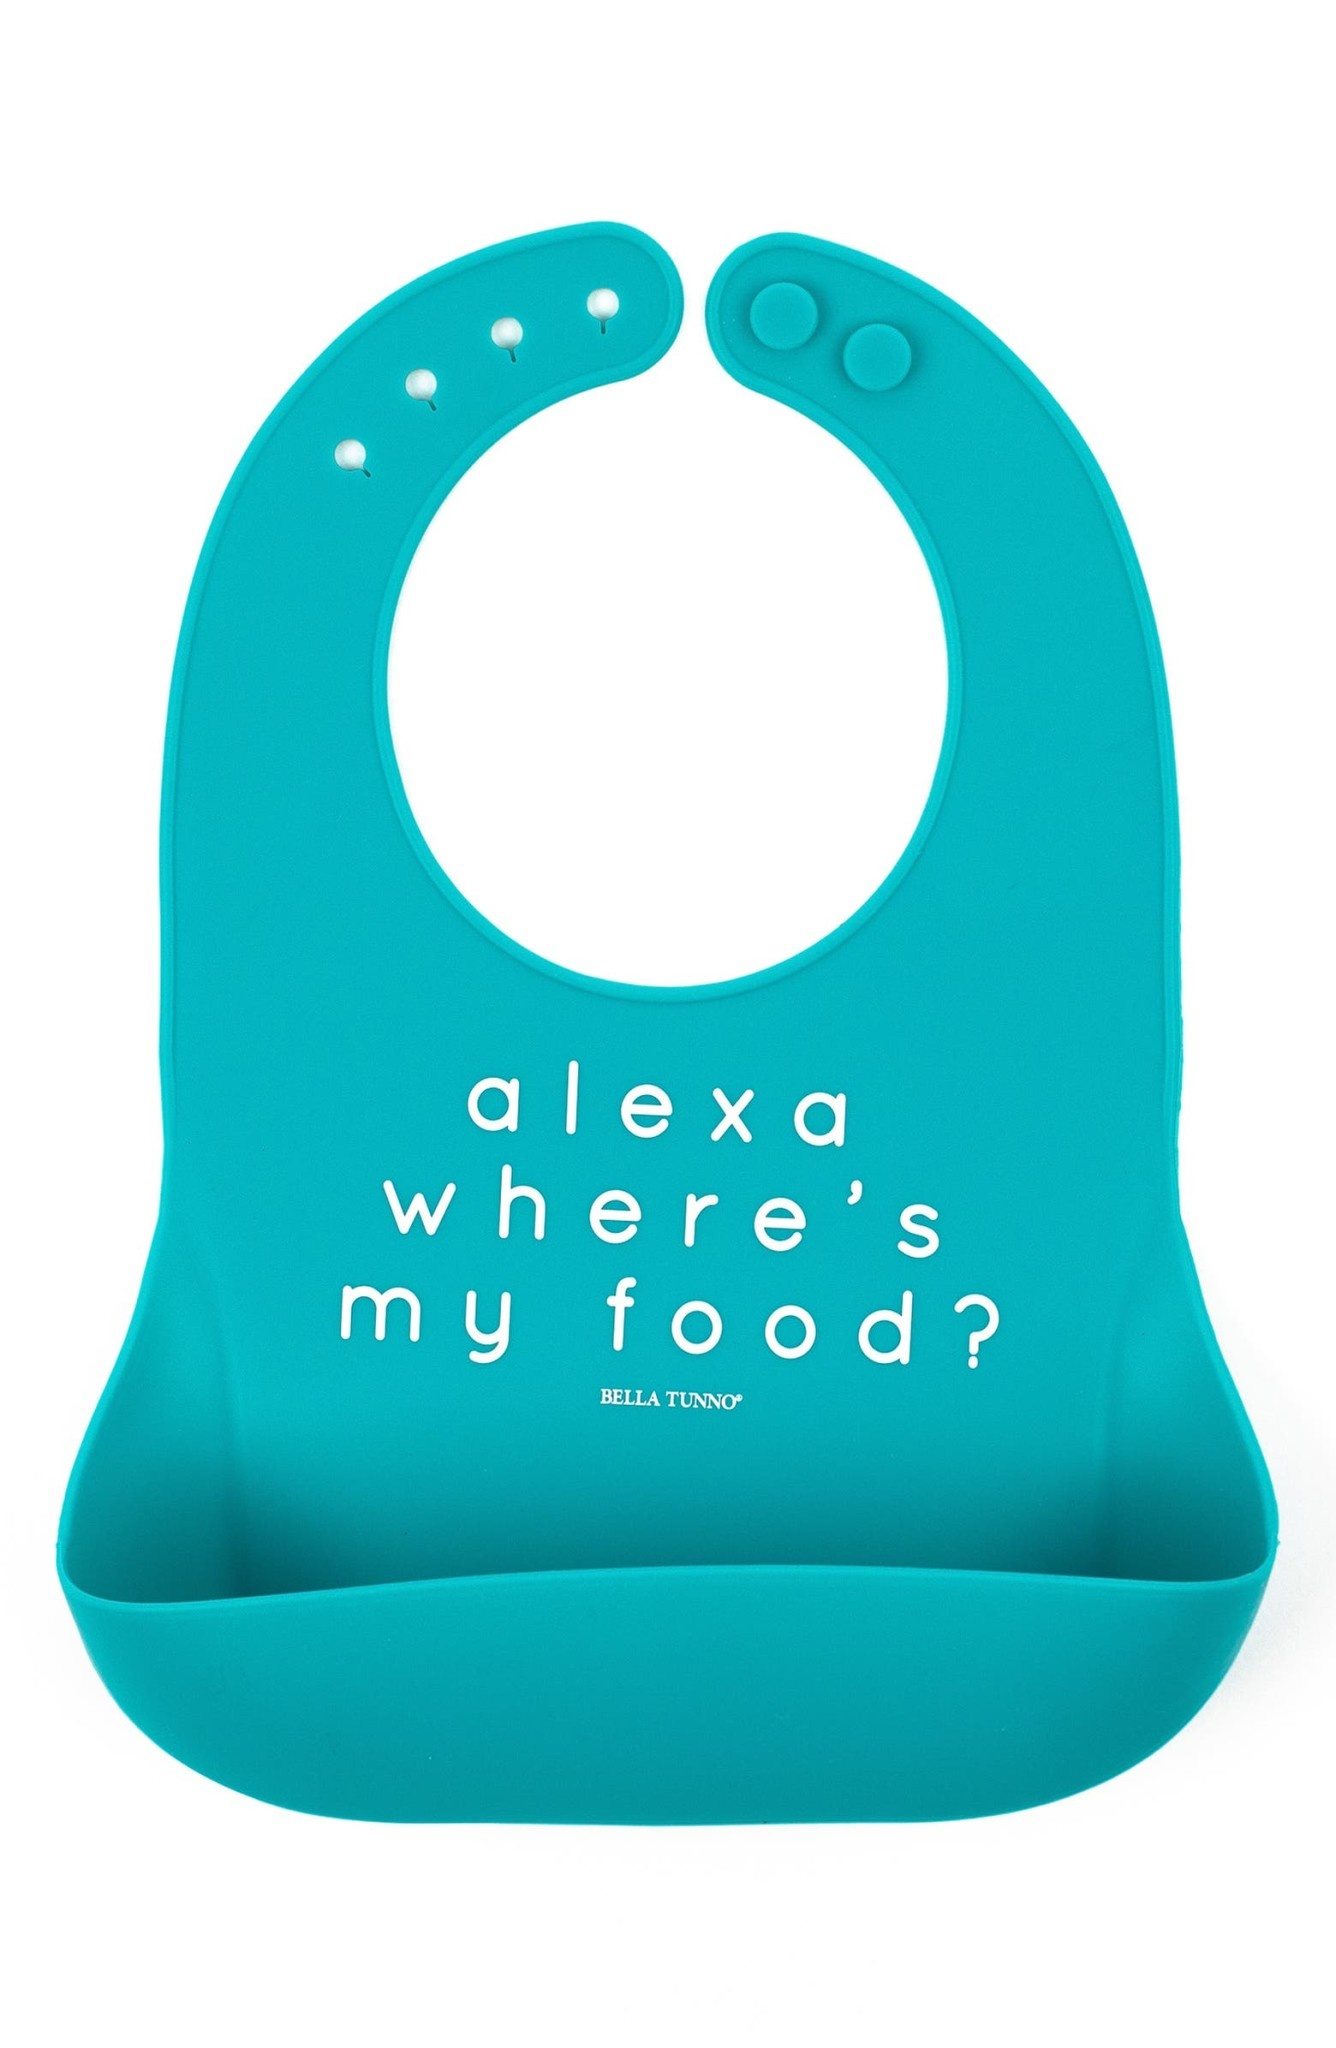 Alexa Wheres My Food Wonder Bib-1